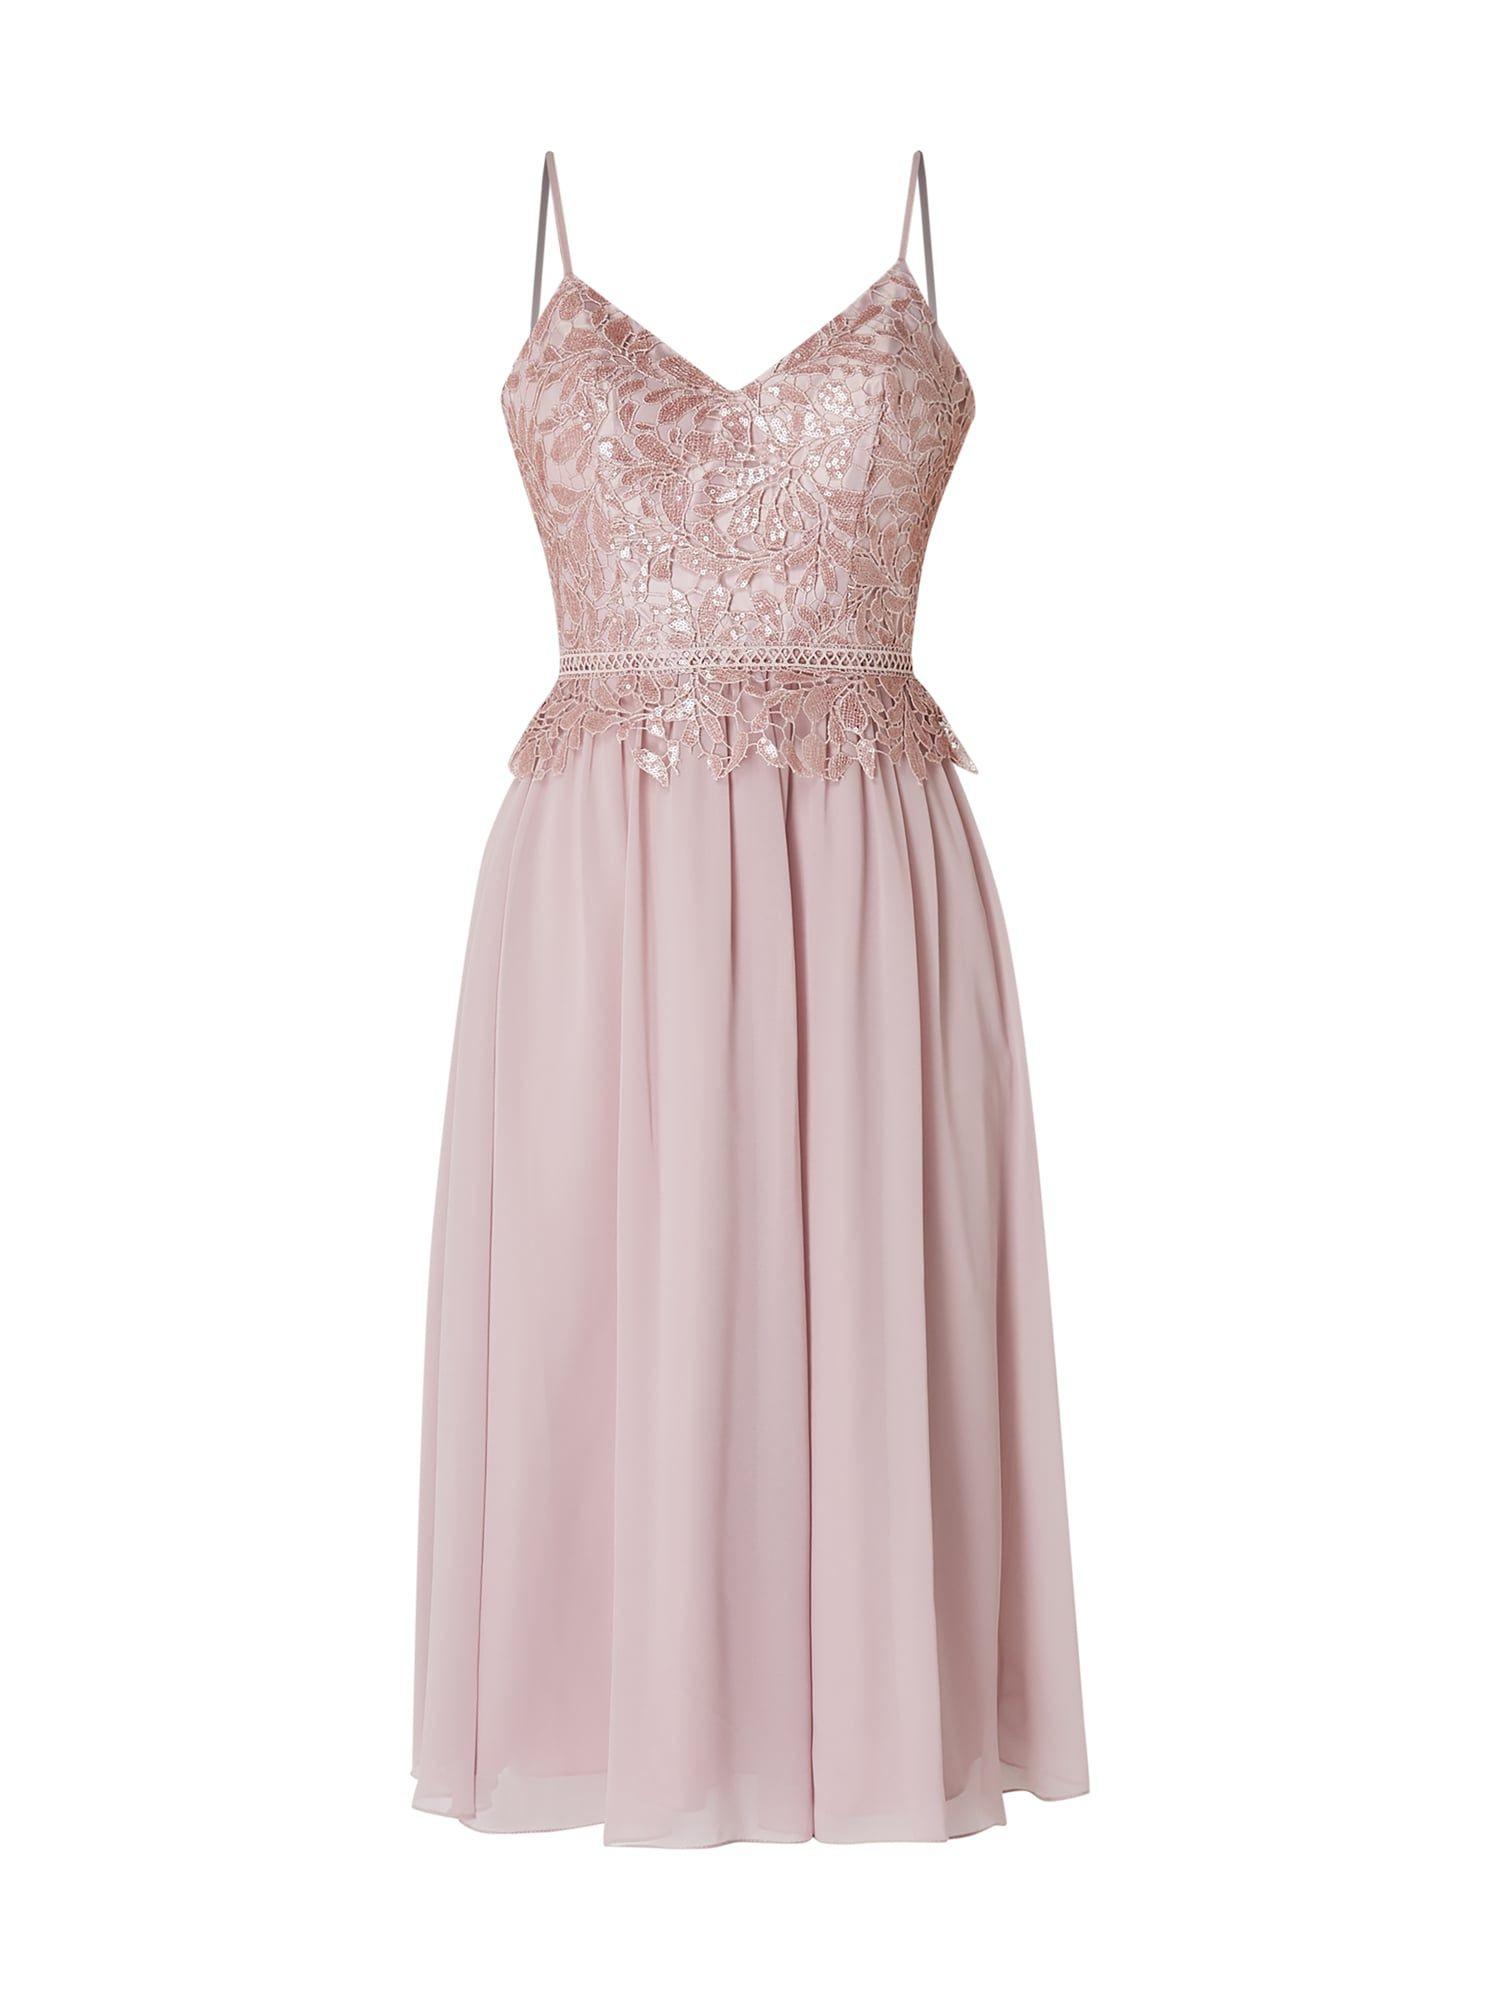 Laona  Cocktailkleid Mit Floraler Spitze  Rosé  Kleid